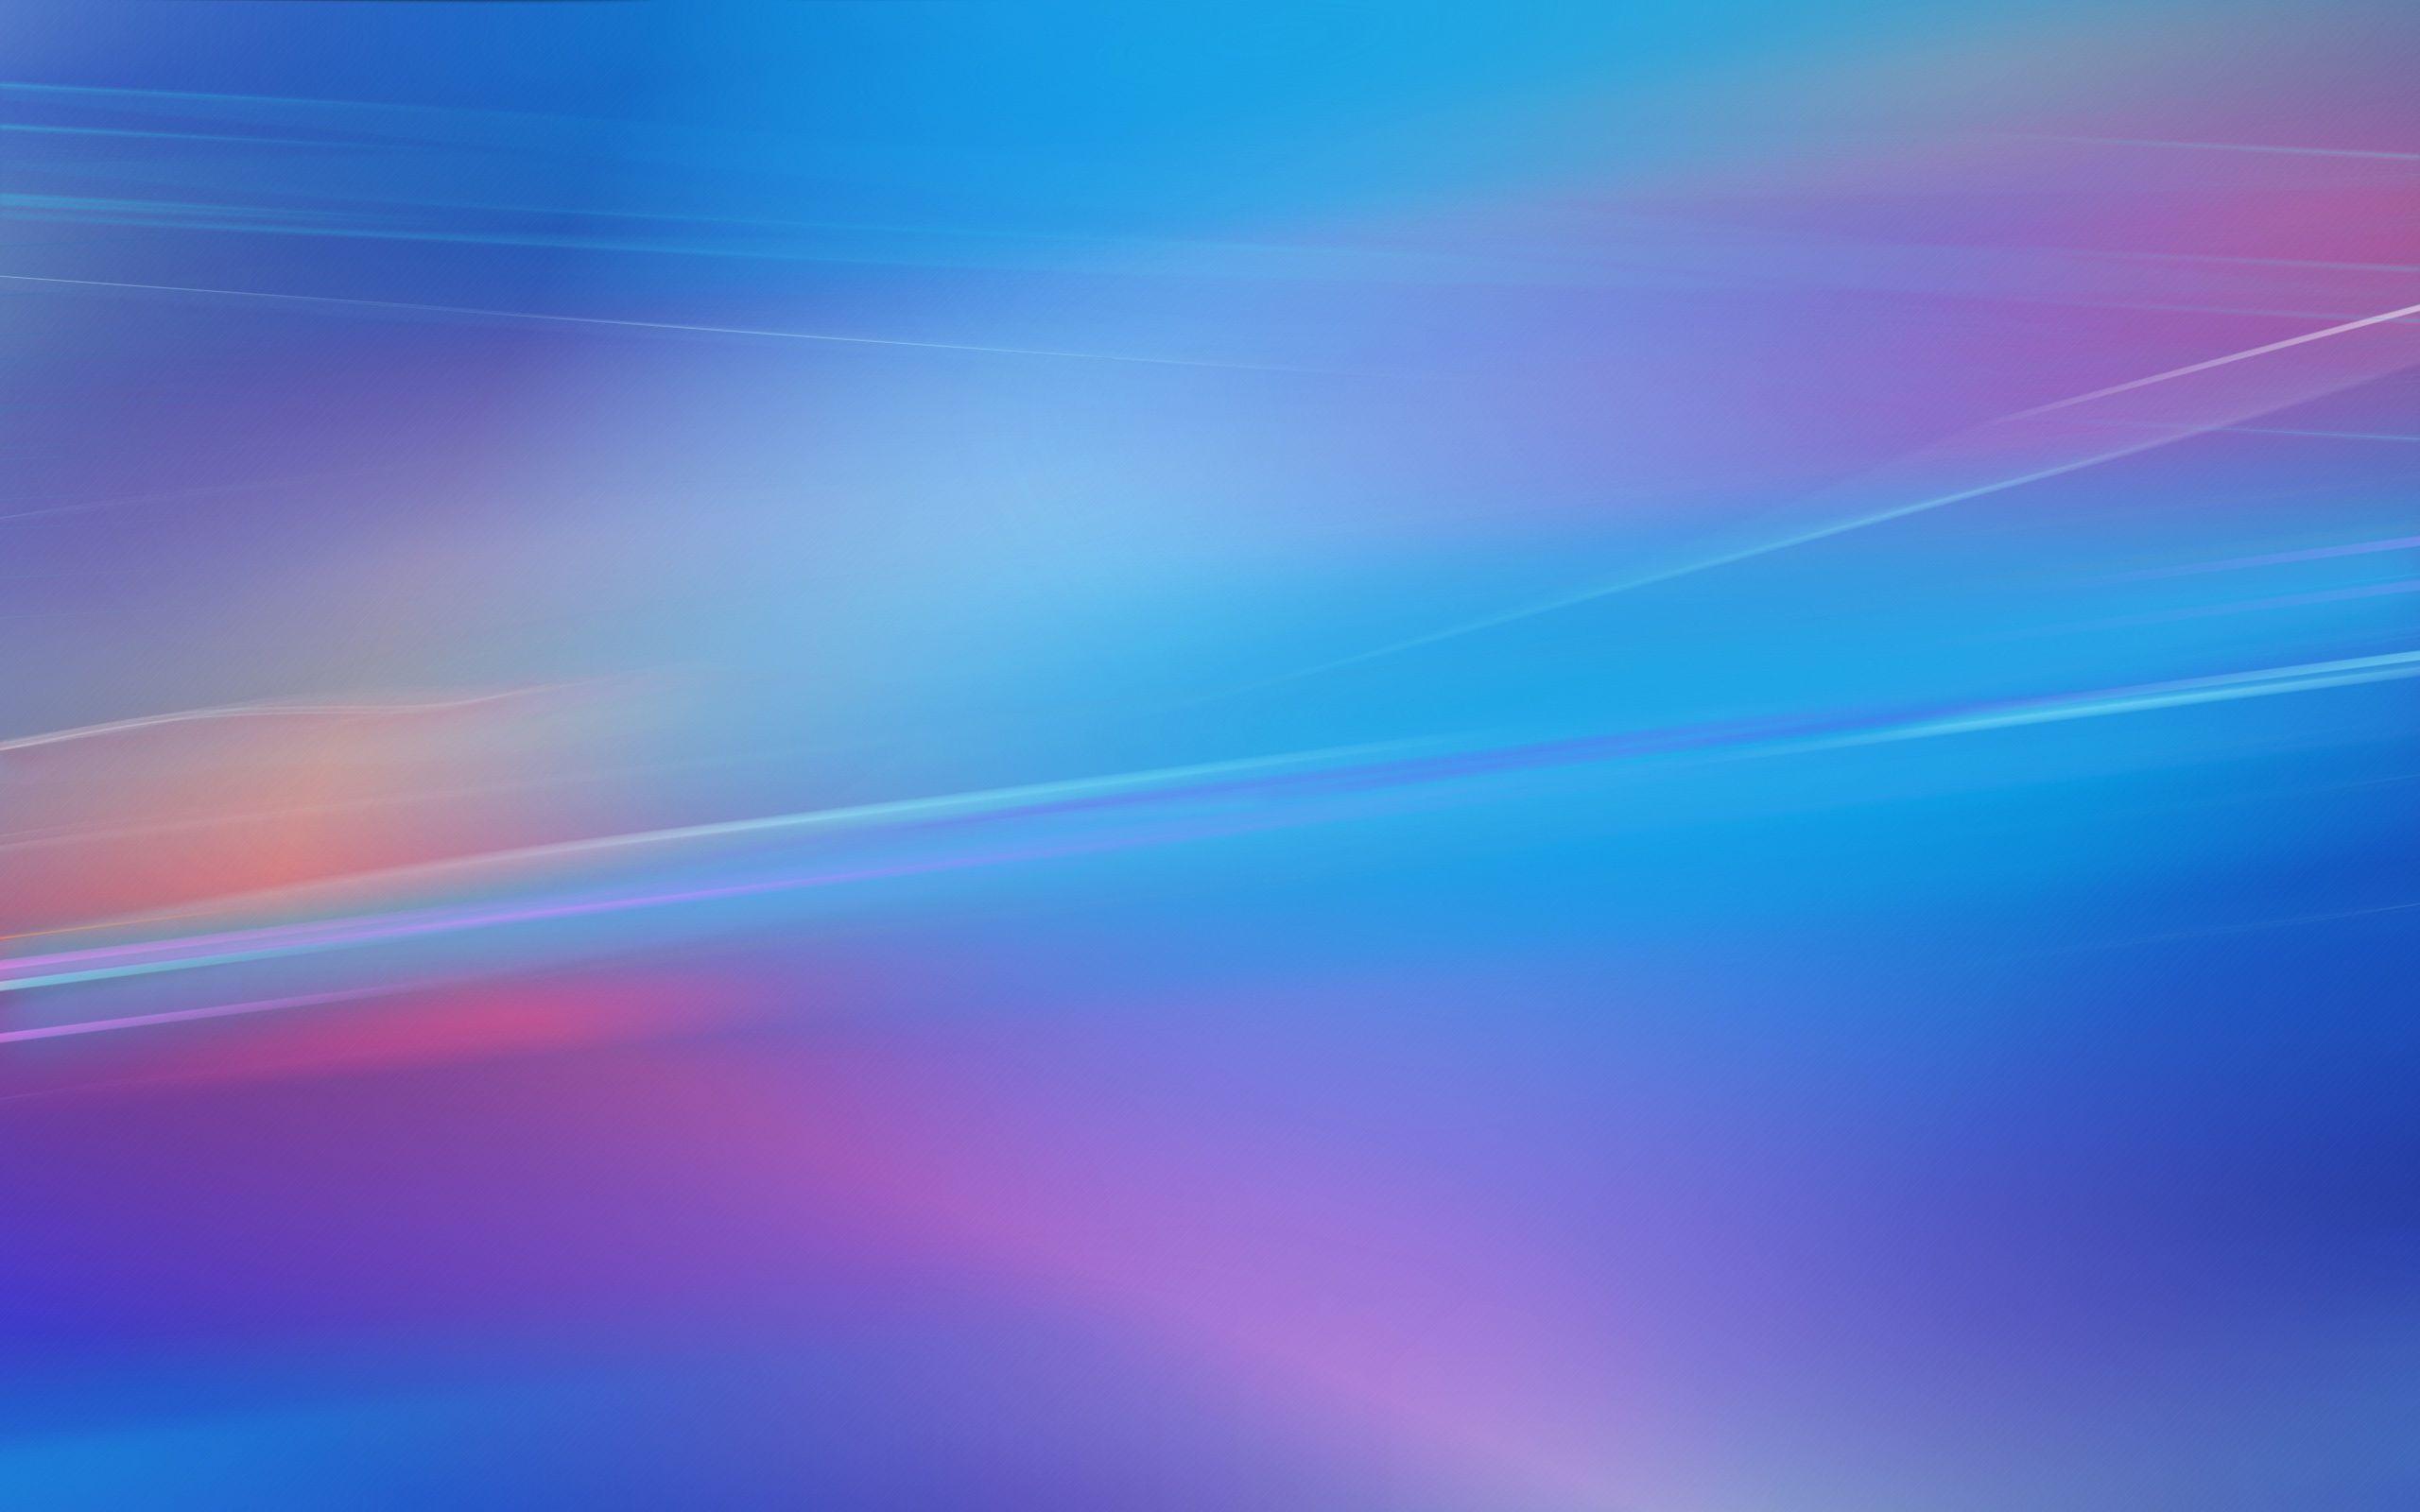 Solid Color Wallpaper   HD Wallpapers Pretty 2560x1600